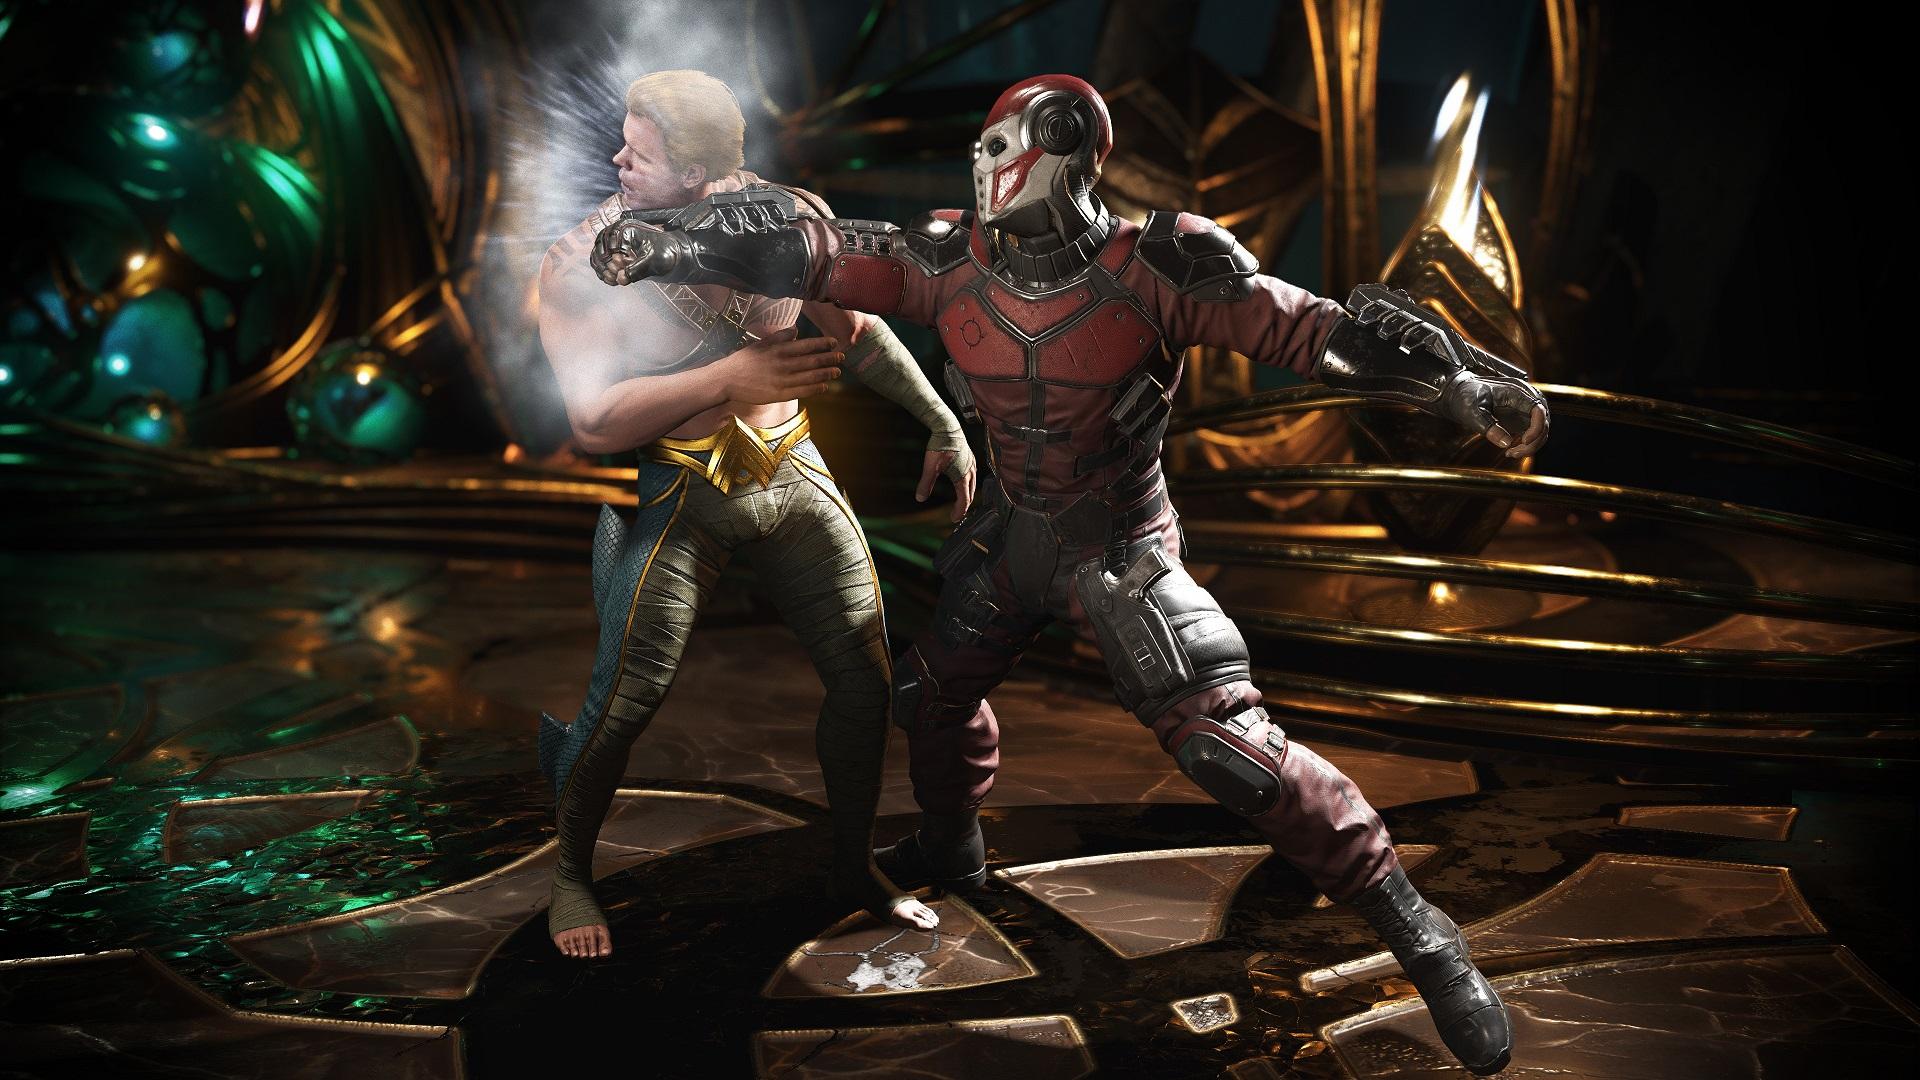 The Injustice 2 achievements confirm an unannounced staple of DC Comics screenshot